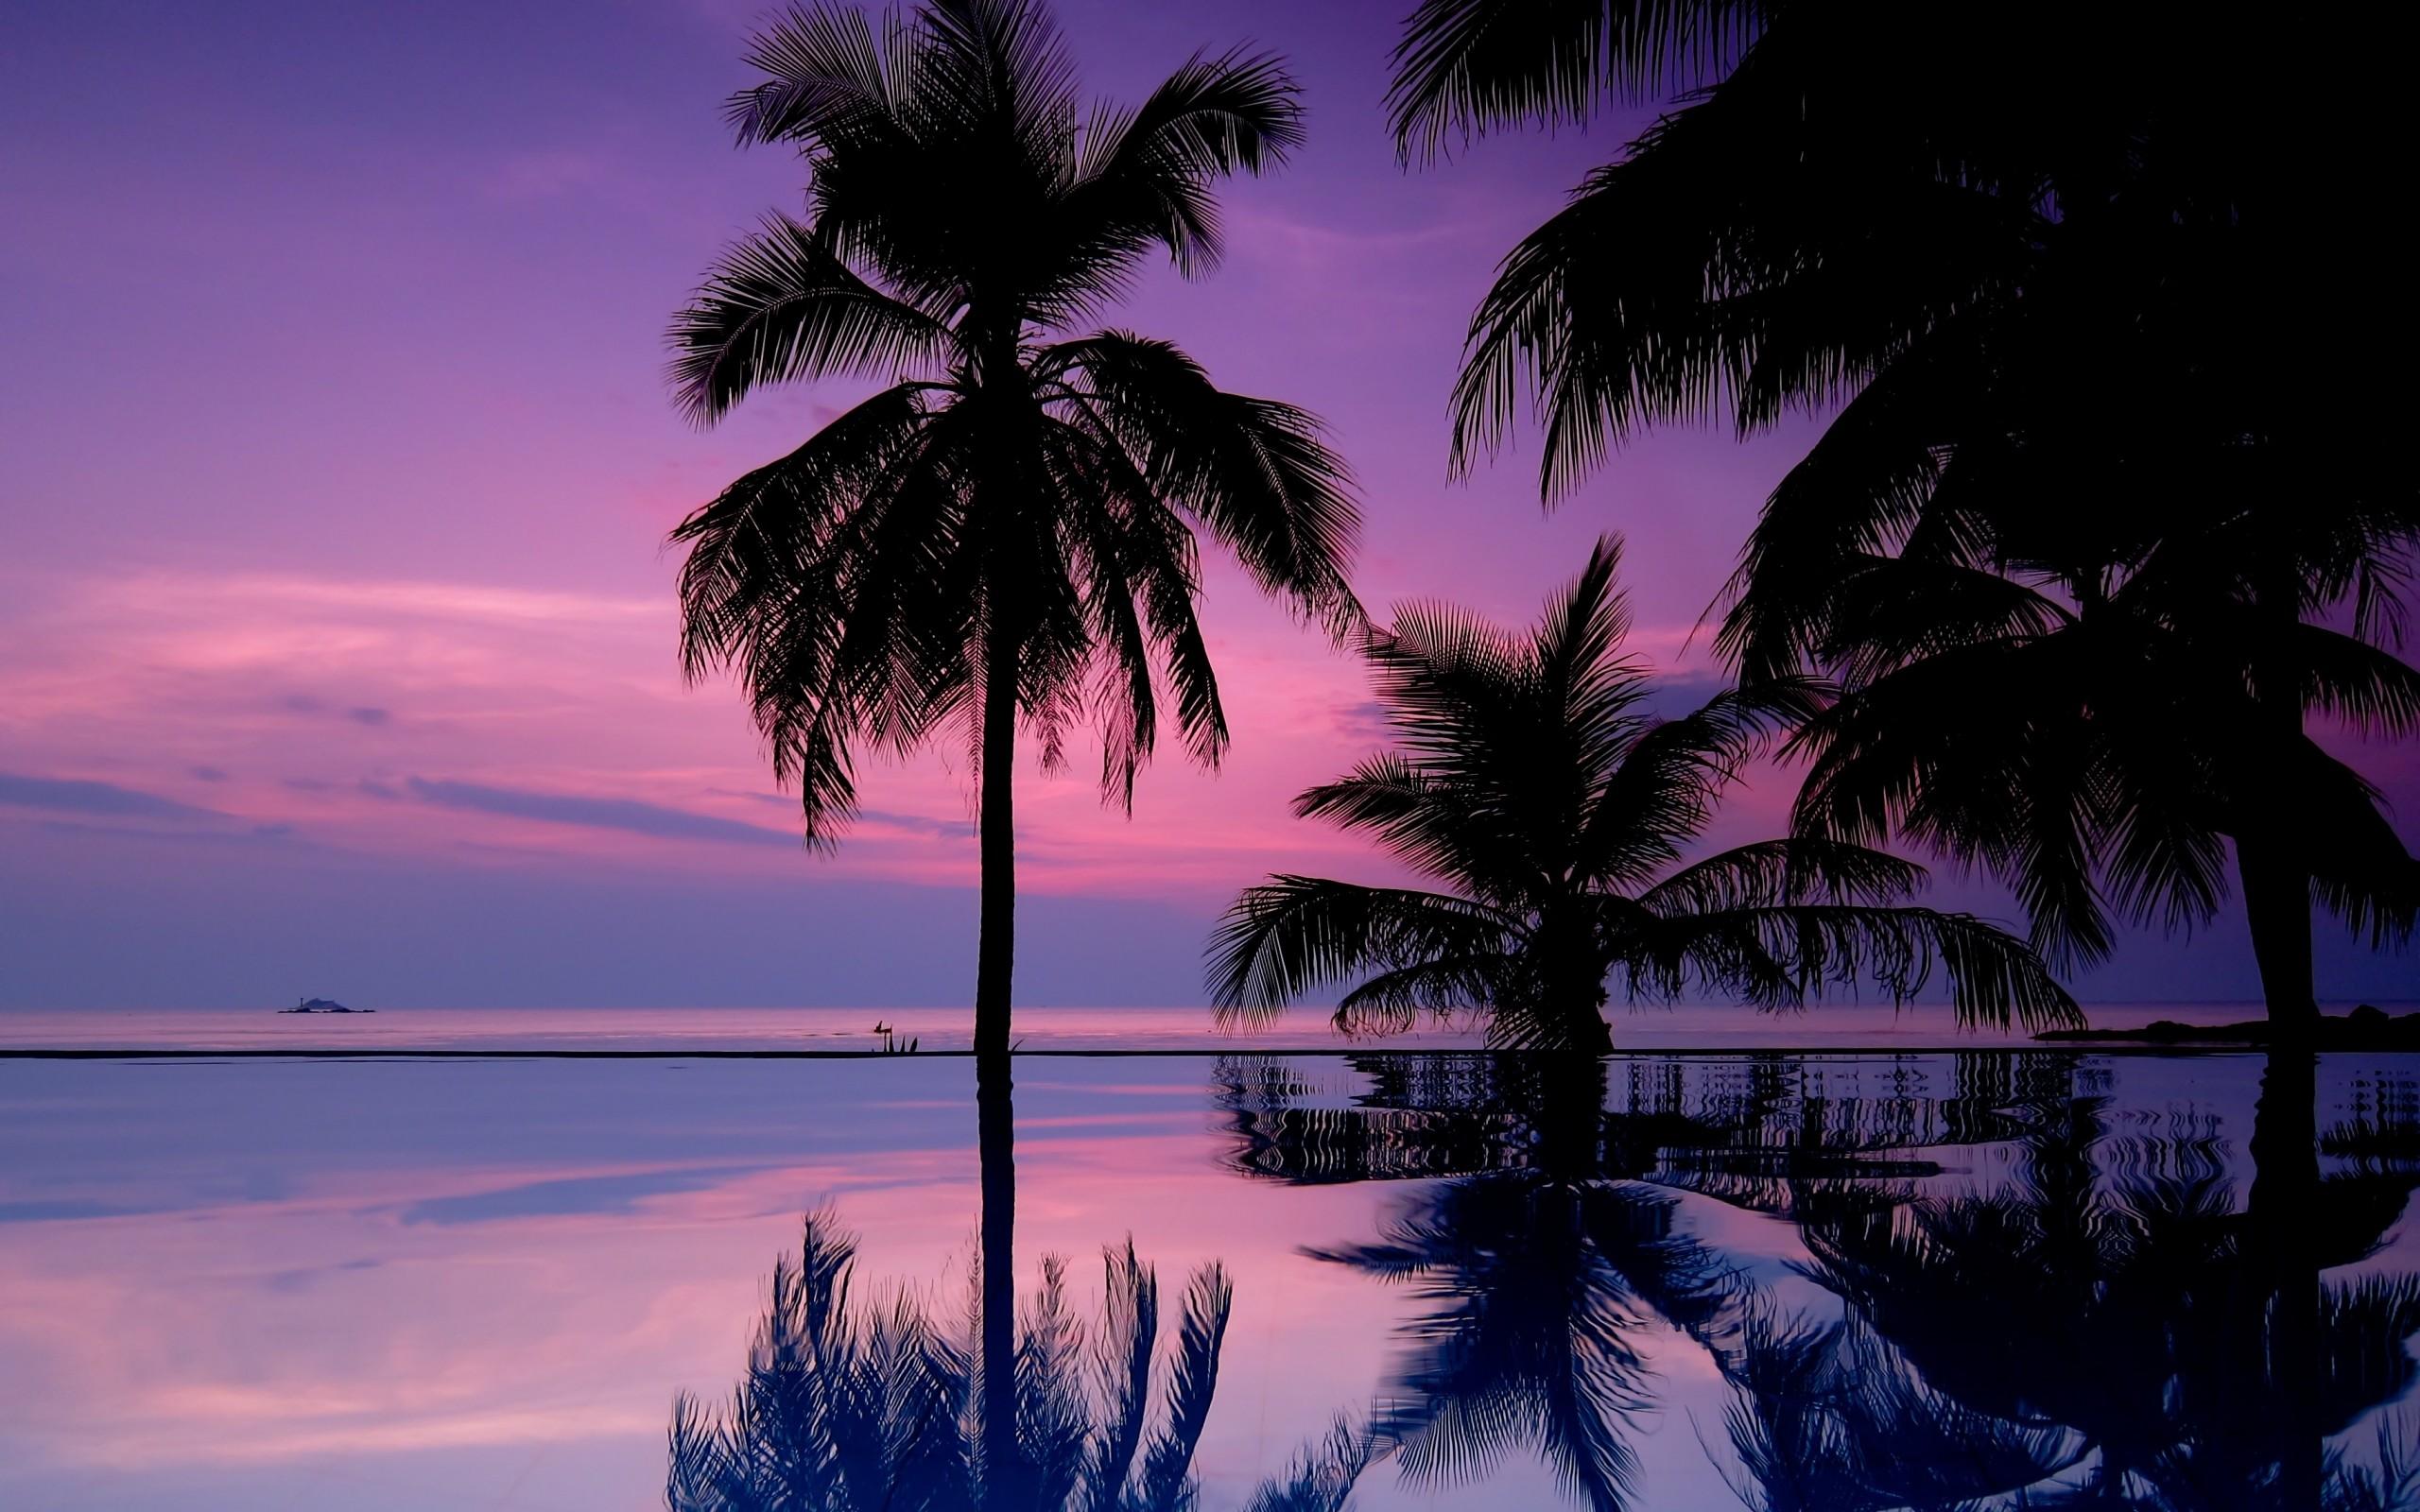 Sunset Palm Trees Iphone Wallpaper   Data-src - Purple Wallpaper Palm Tree - HD Wallpaper